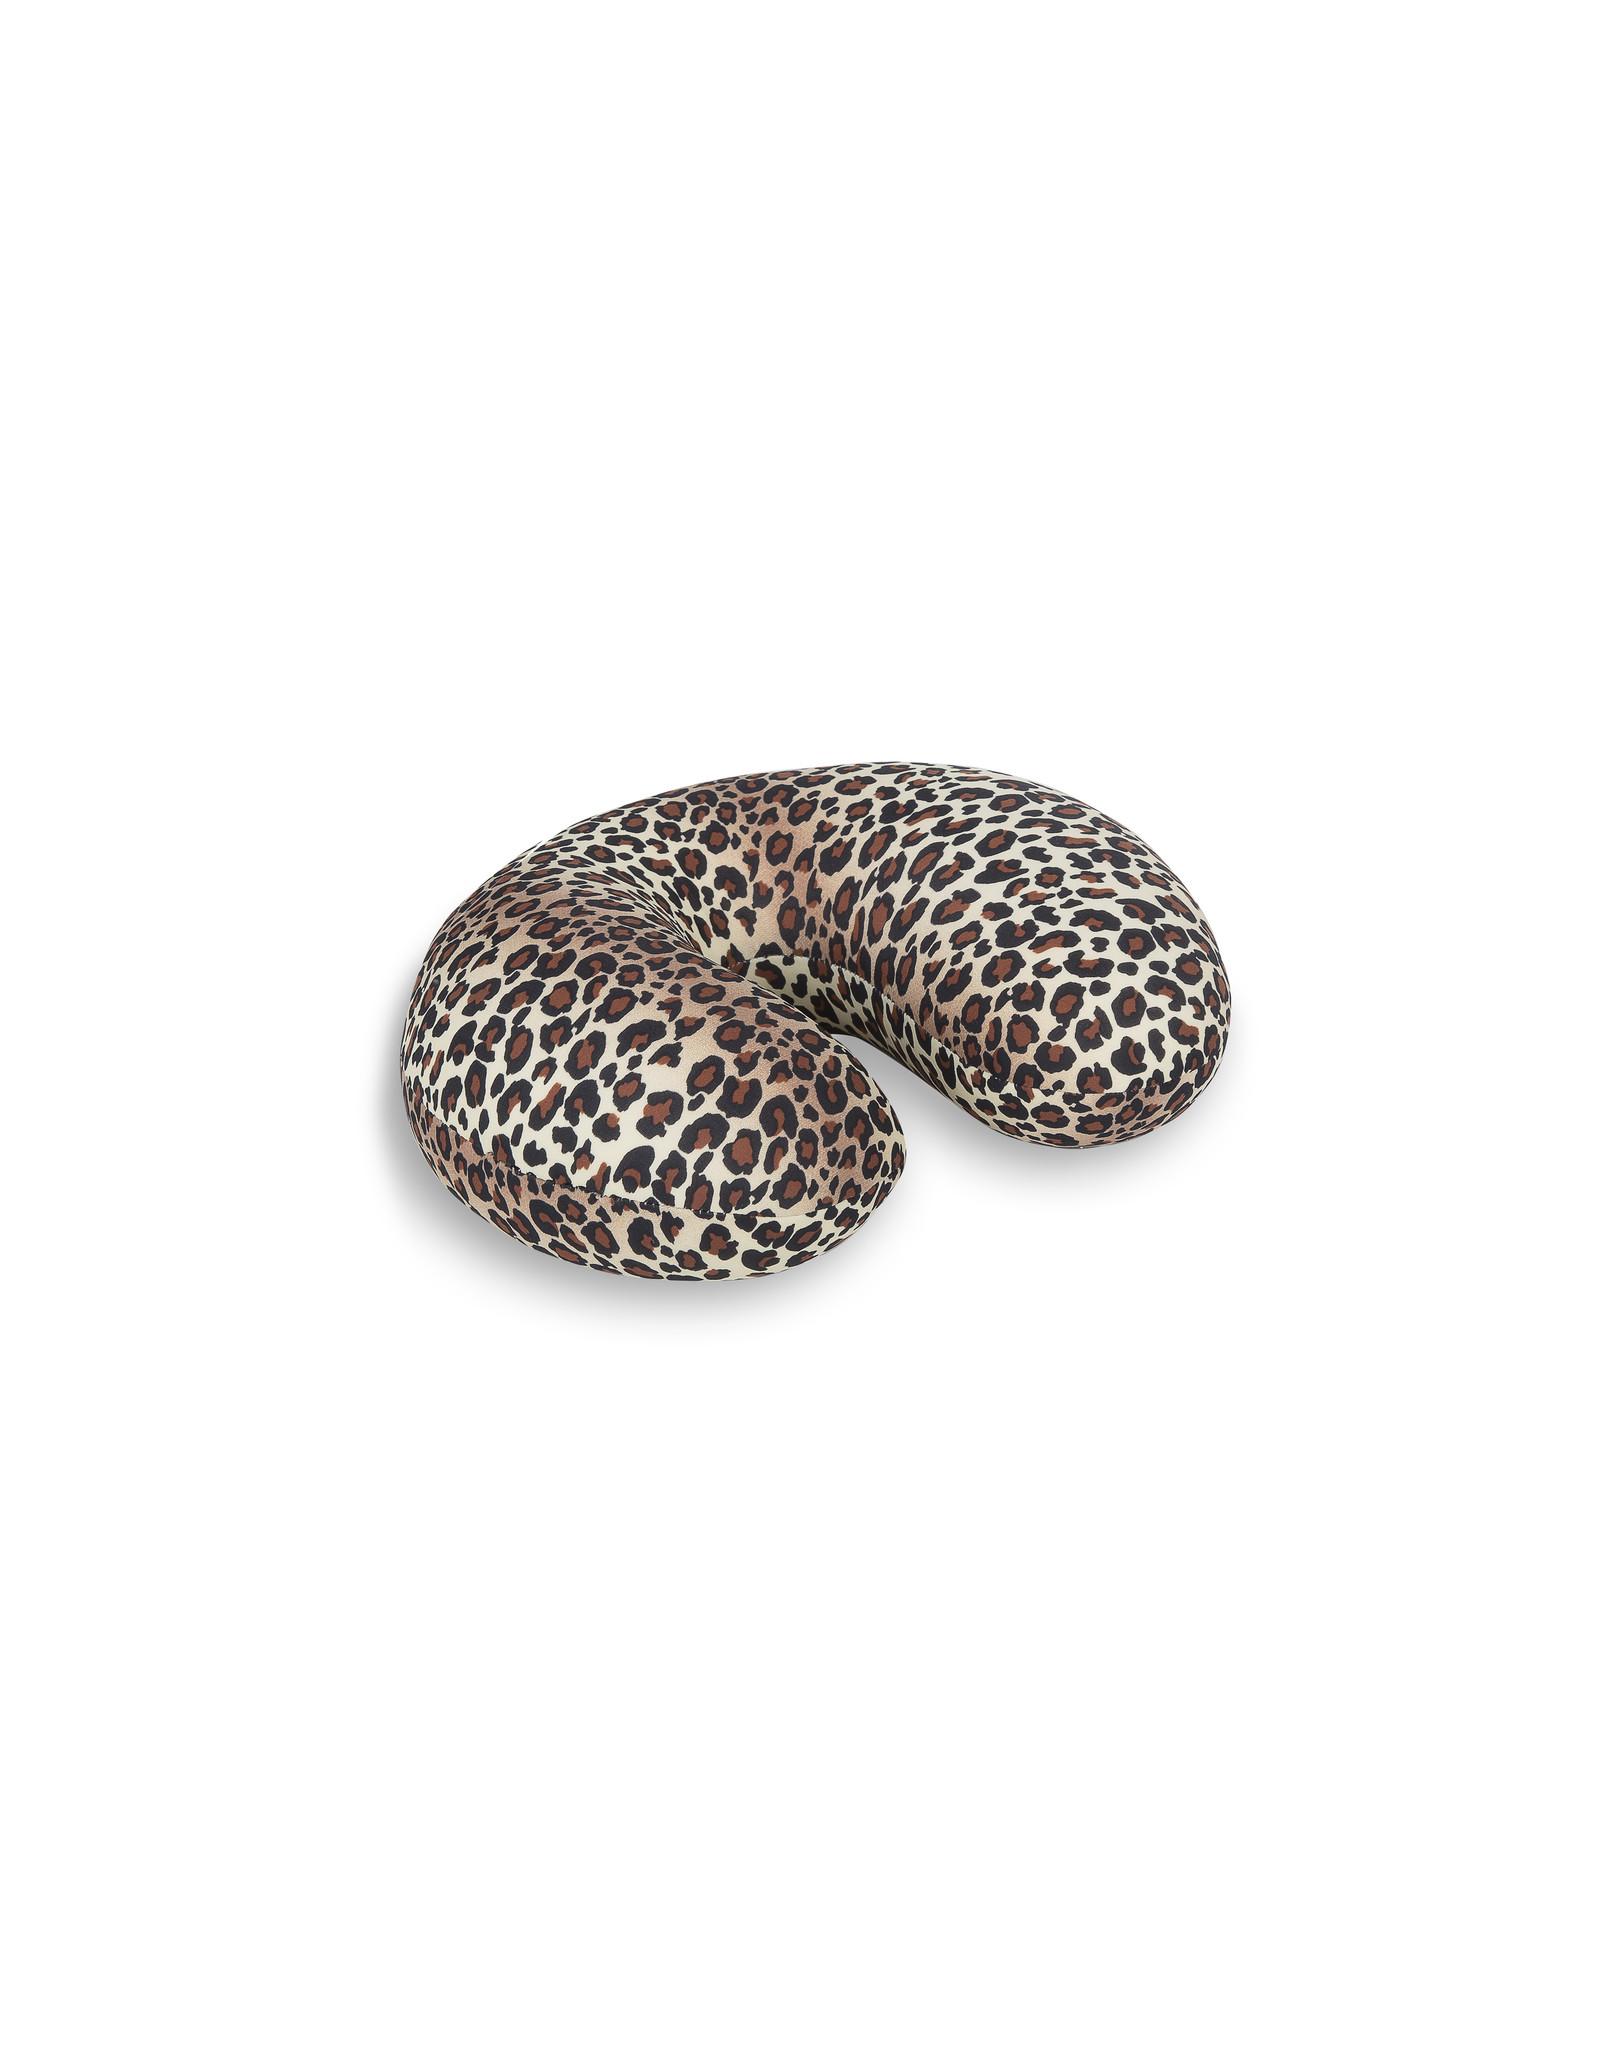 Kuschel-Maxx Kuschel-Maxx - Kindernackenhörnchen Leopard